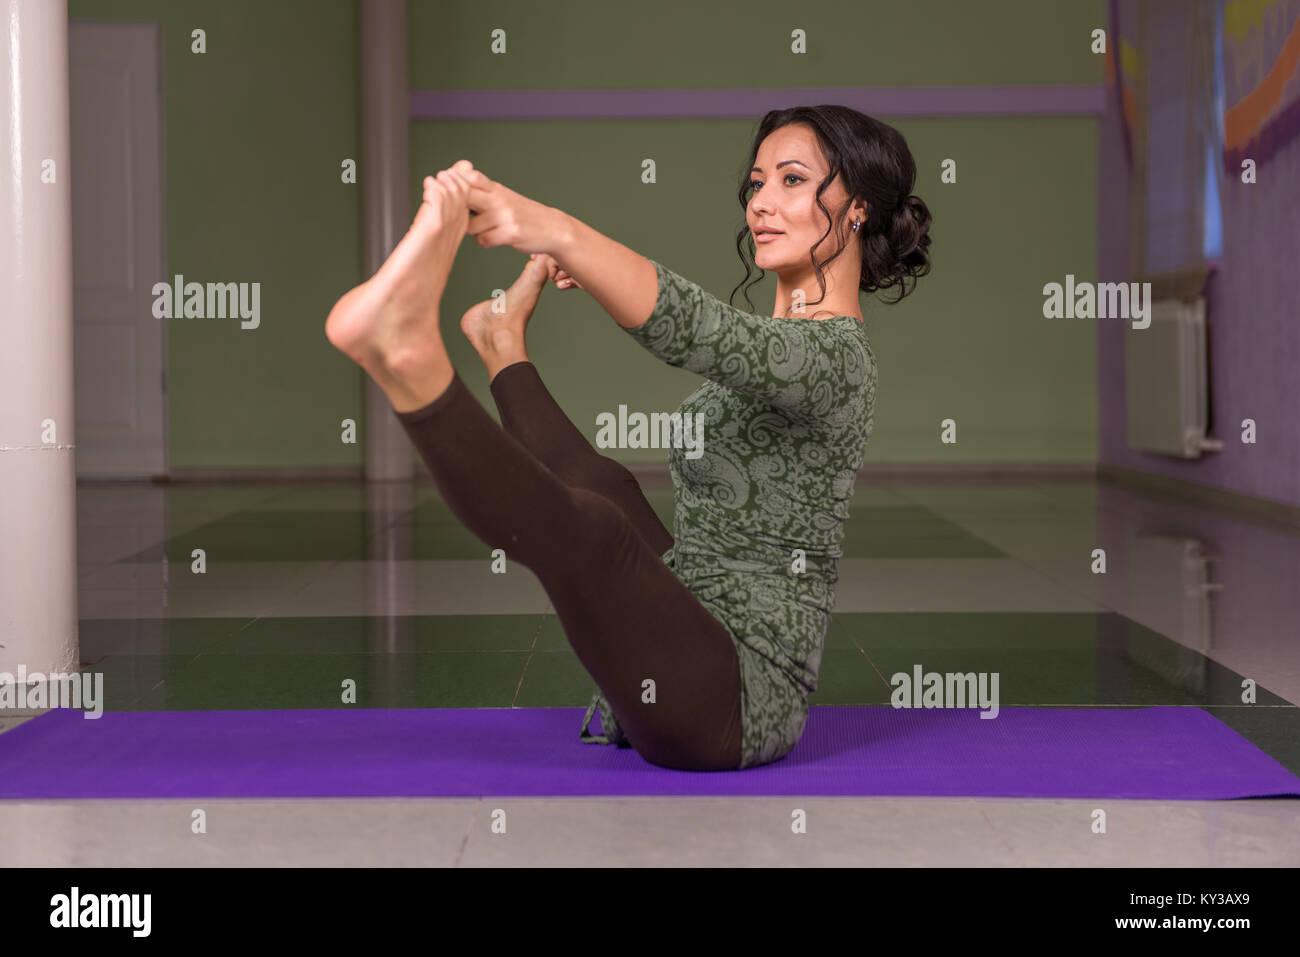 Yogi performing yoga poses  - Stock Image